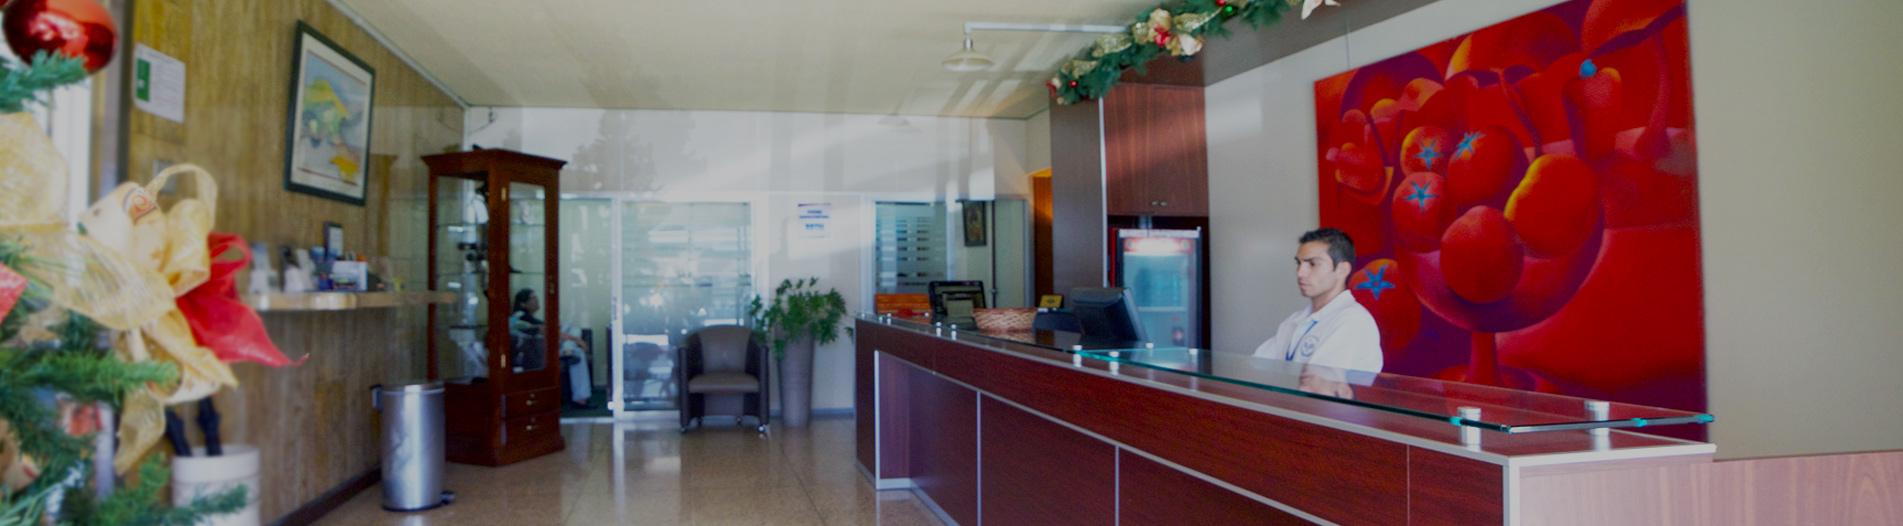 sliderhotel014